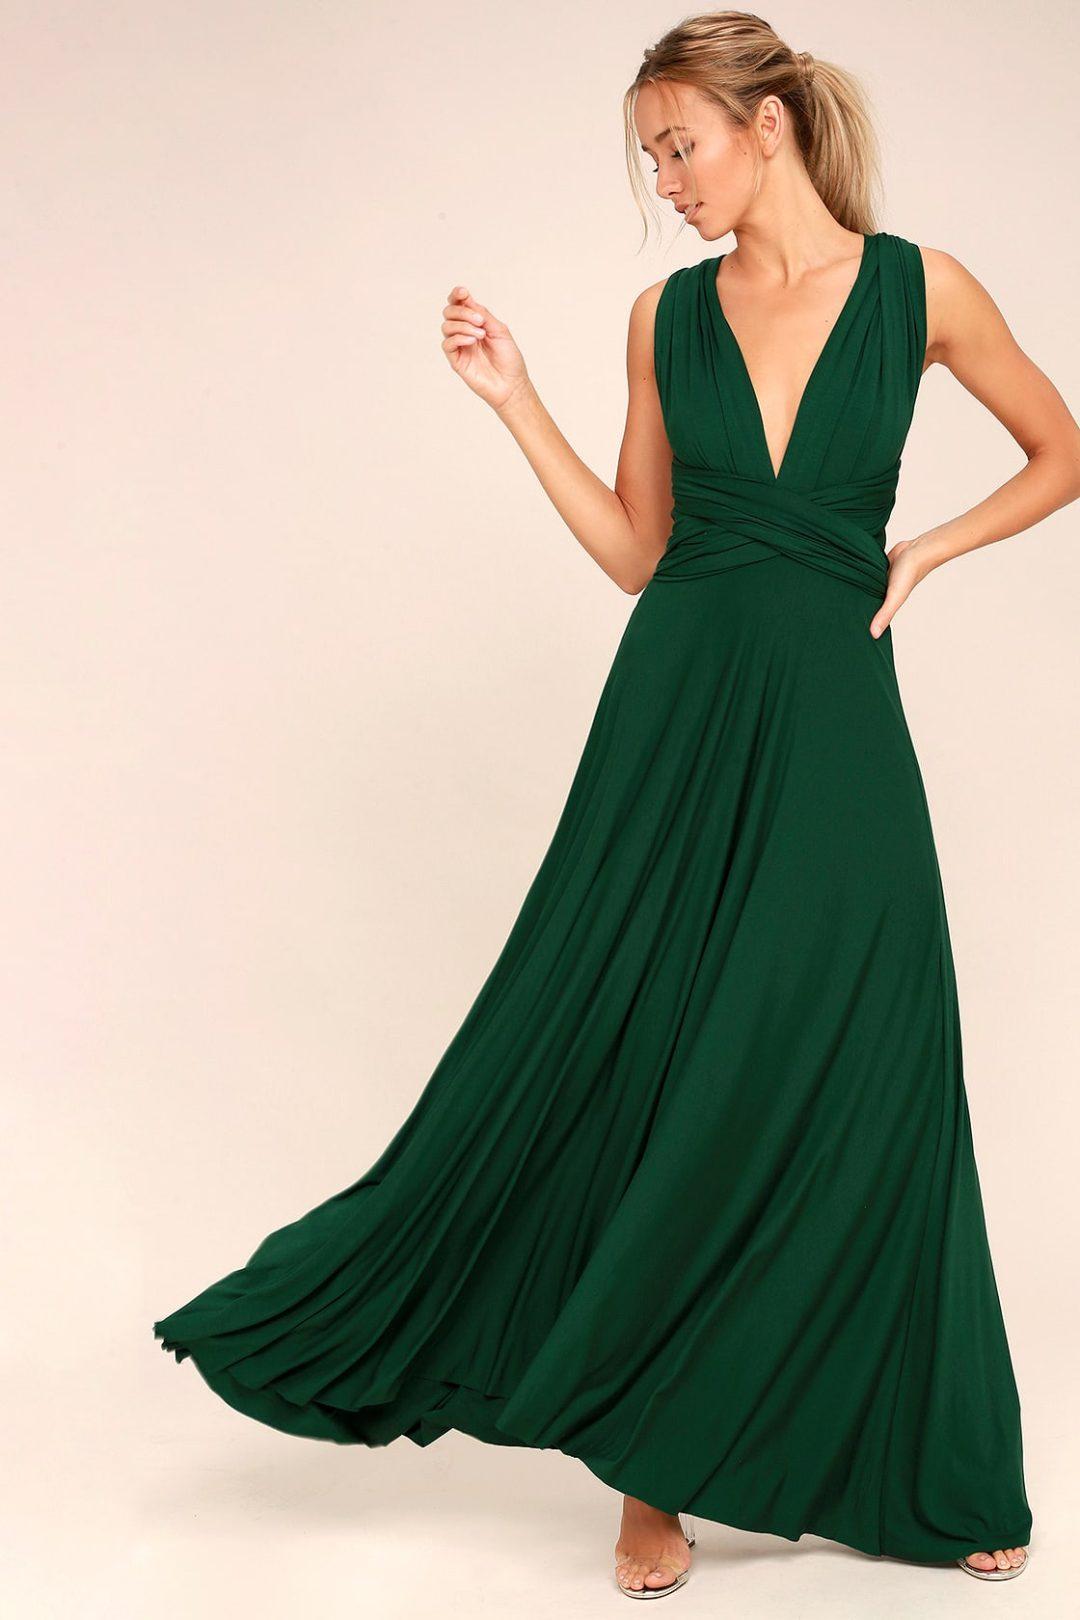 Forest green nursing dress for wedding guest